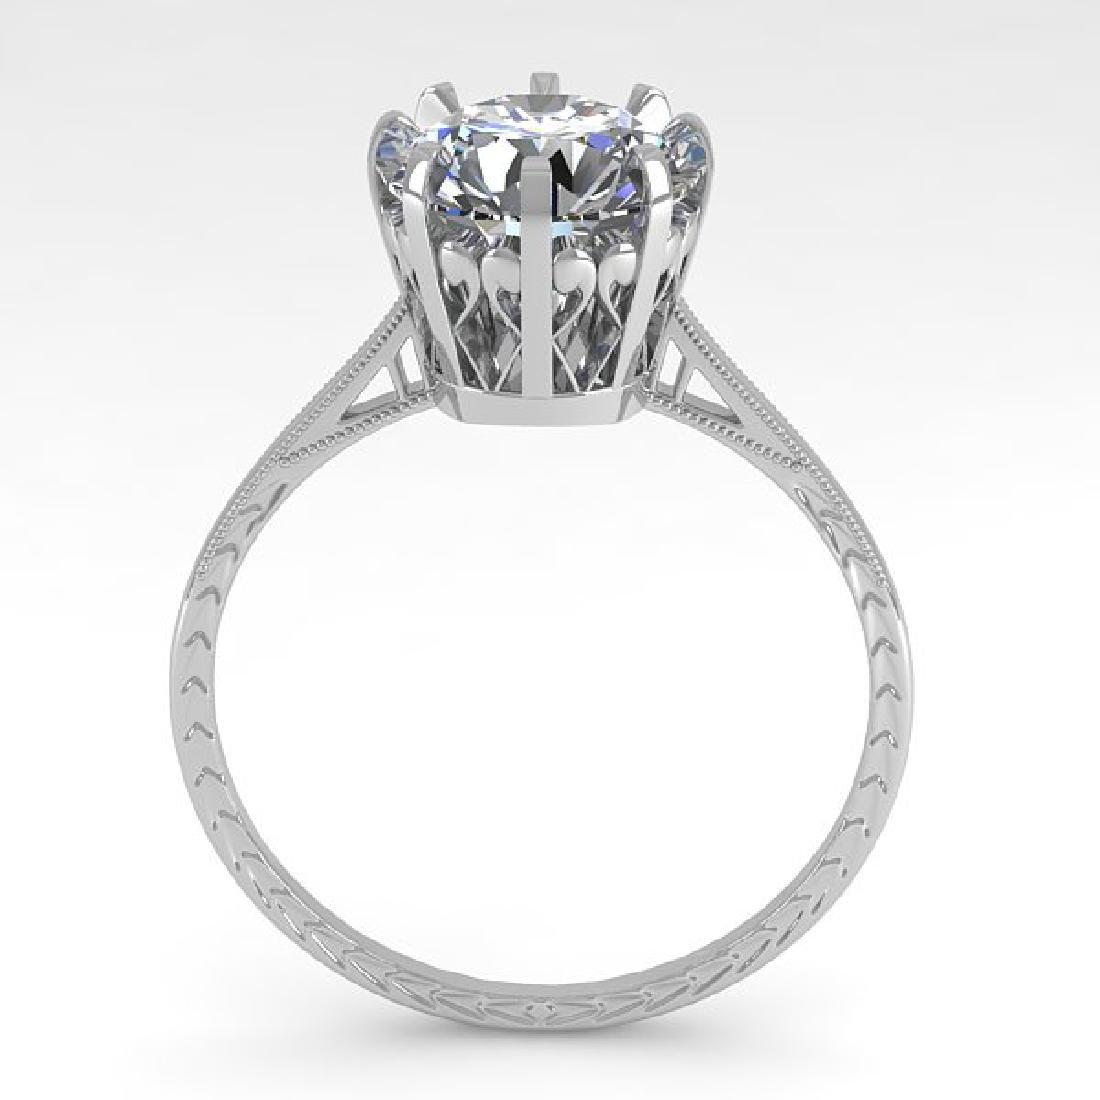 2 CTW VS/SI Diamond Solitaire Engagement Ring 14K White - 3